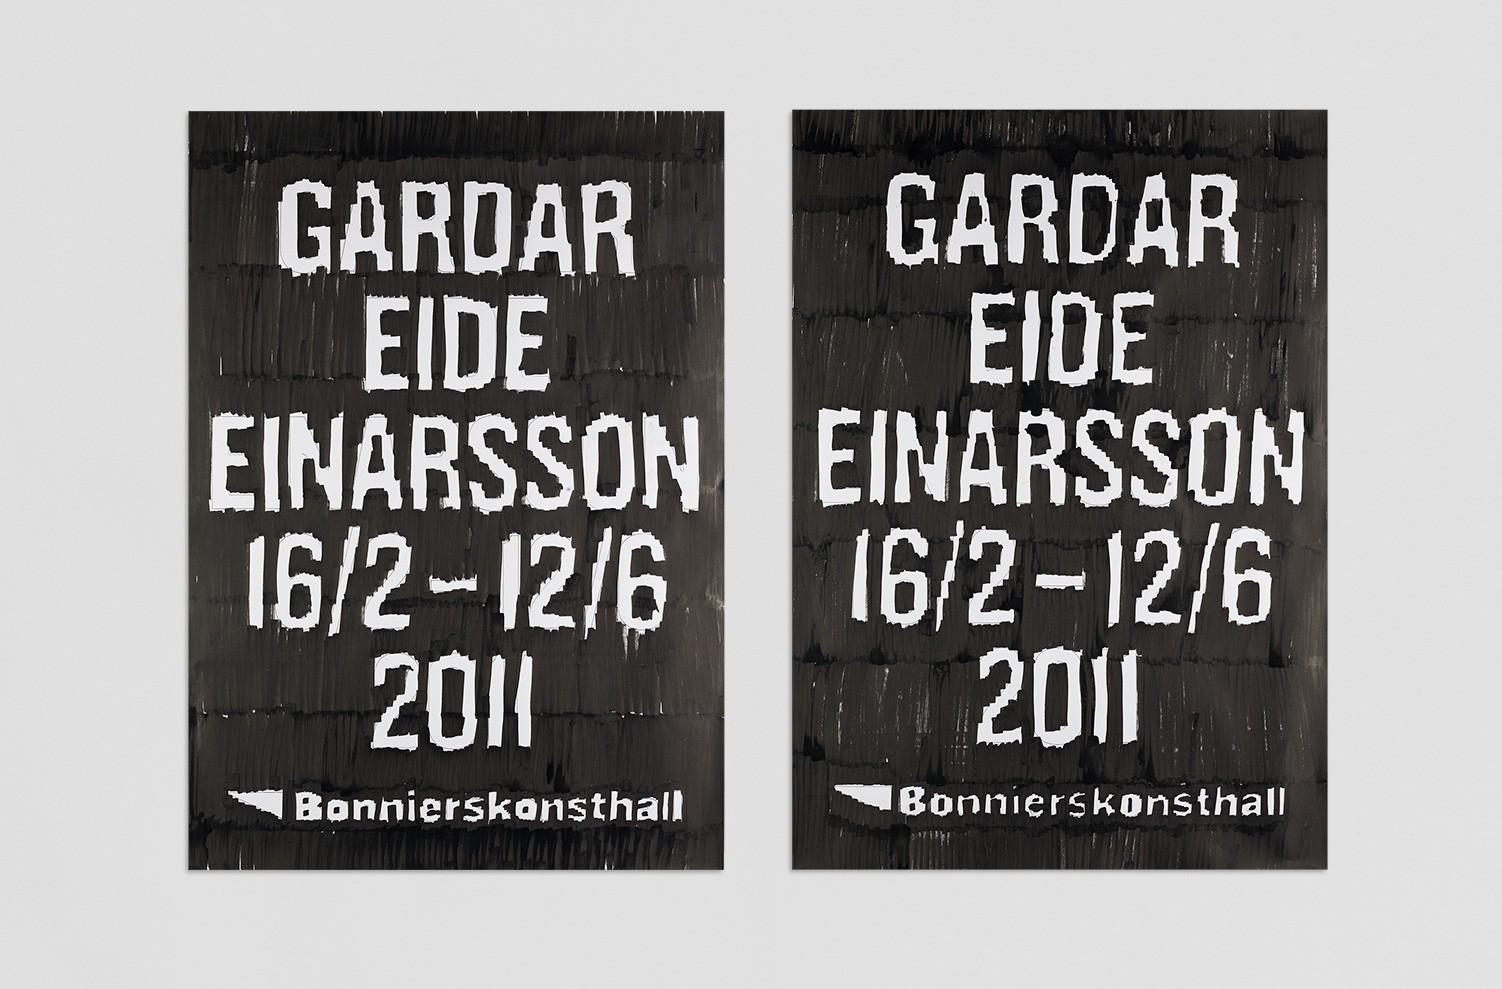 ritator_bonniers_konsthall_gardar_eide_einarsson_campaign_21